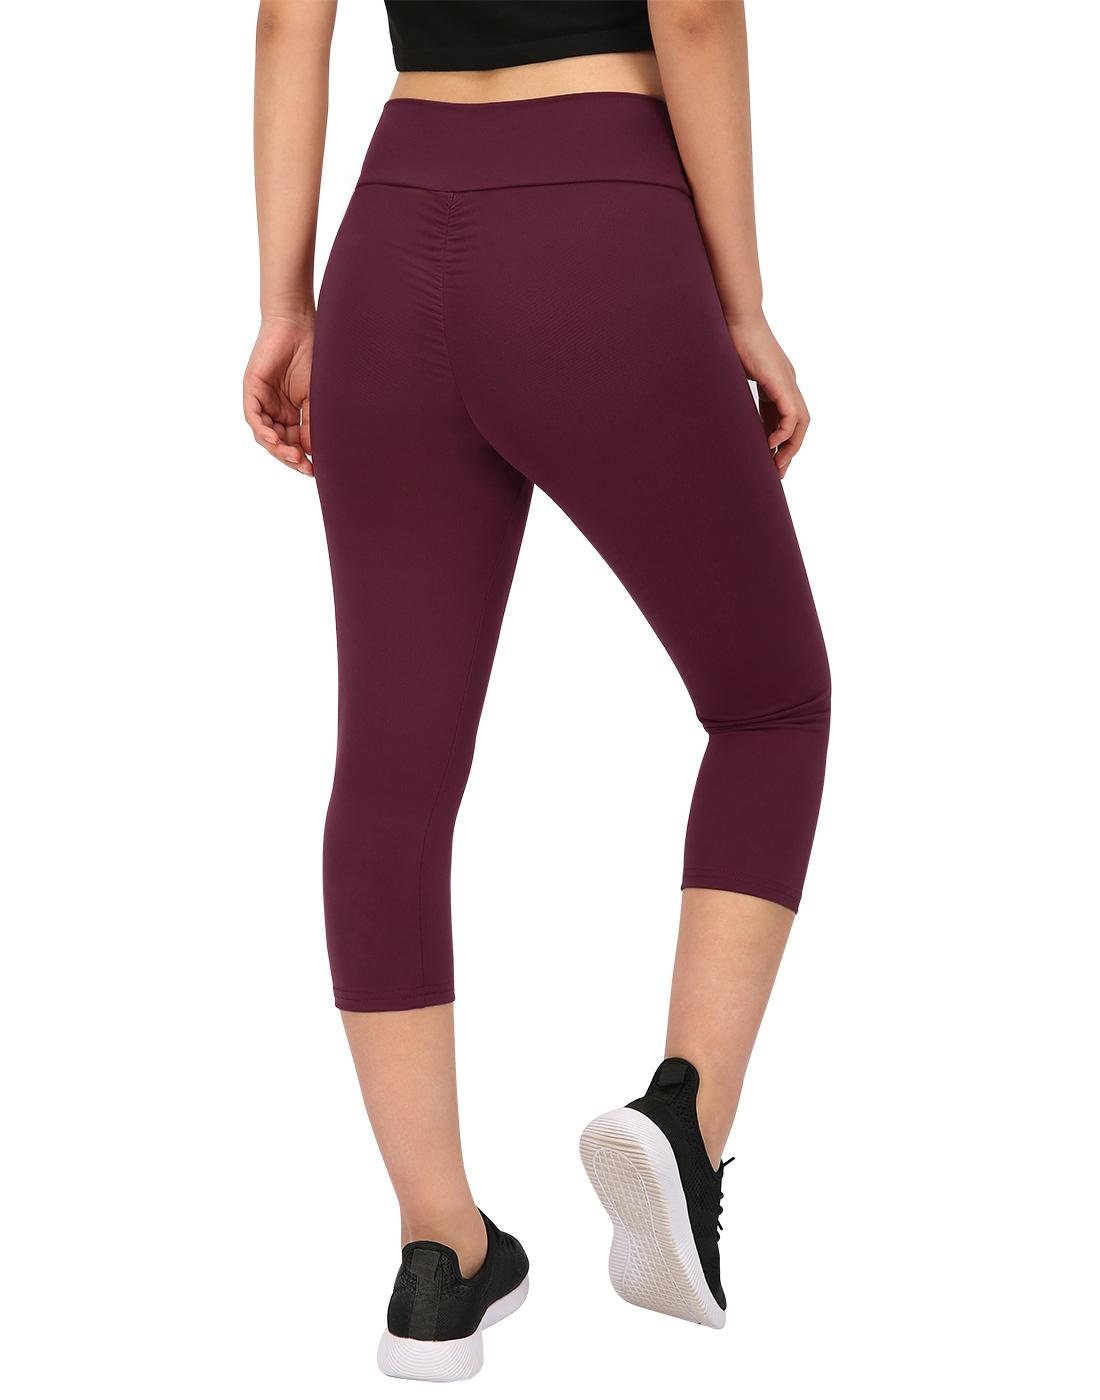 HDE Womens Scrunch Butt Lifting Capri Leggings High Waist Workout Gym Yoga Pants (Maroon, Medium)